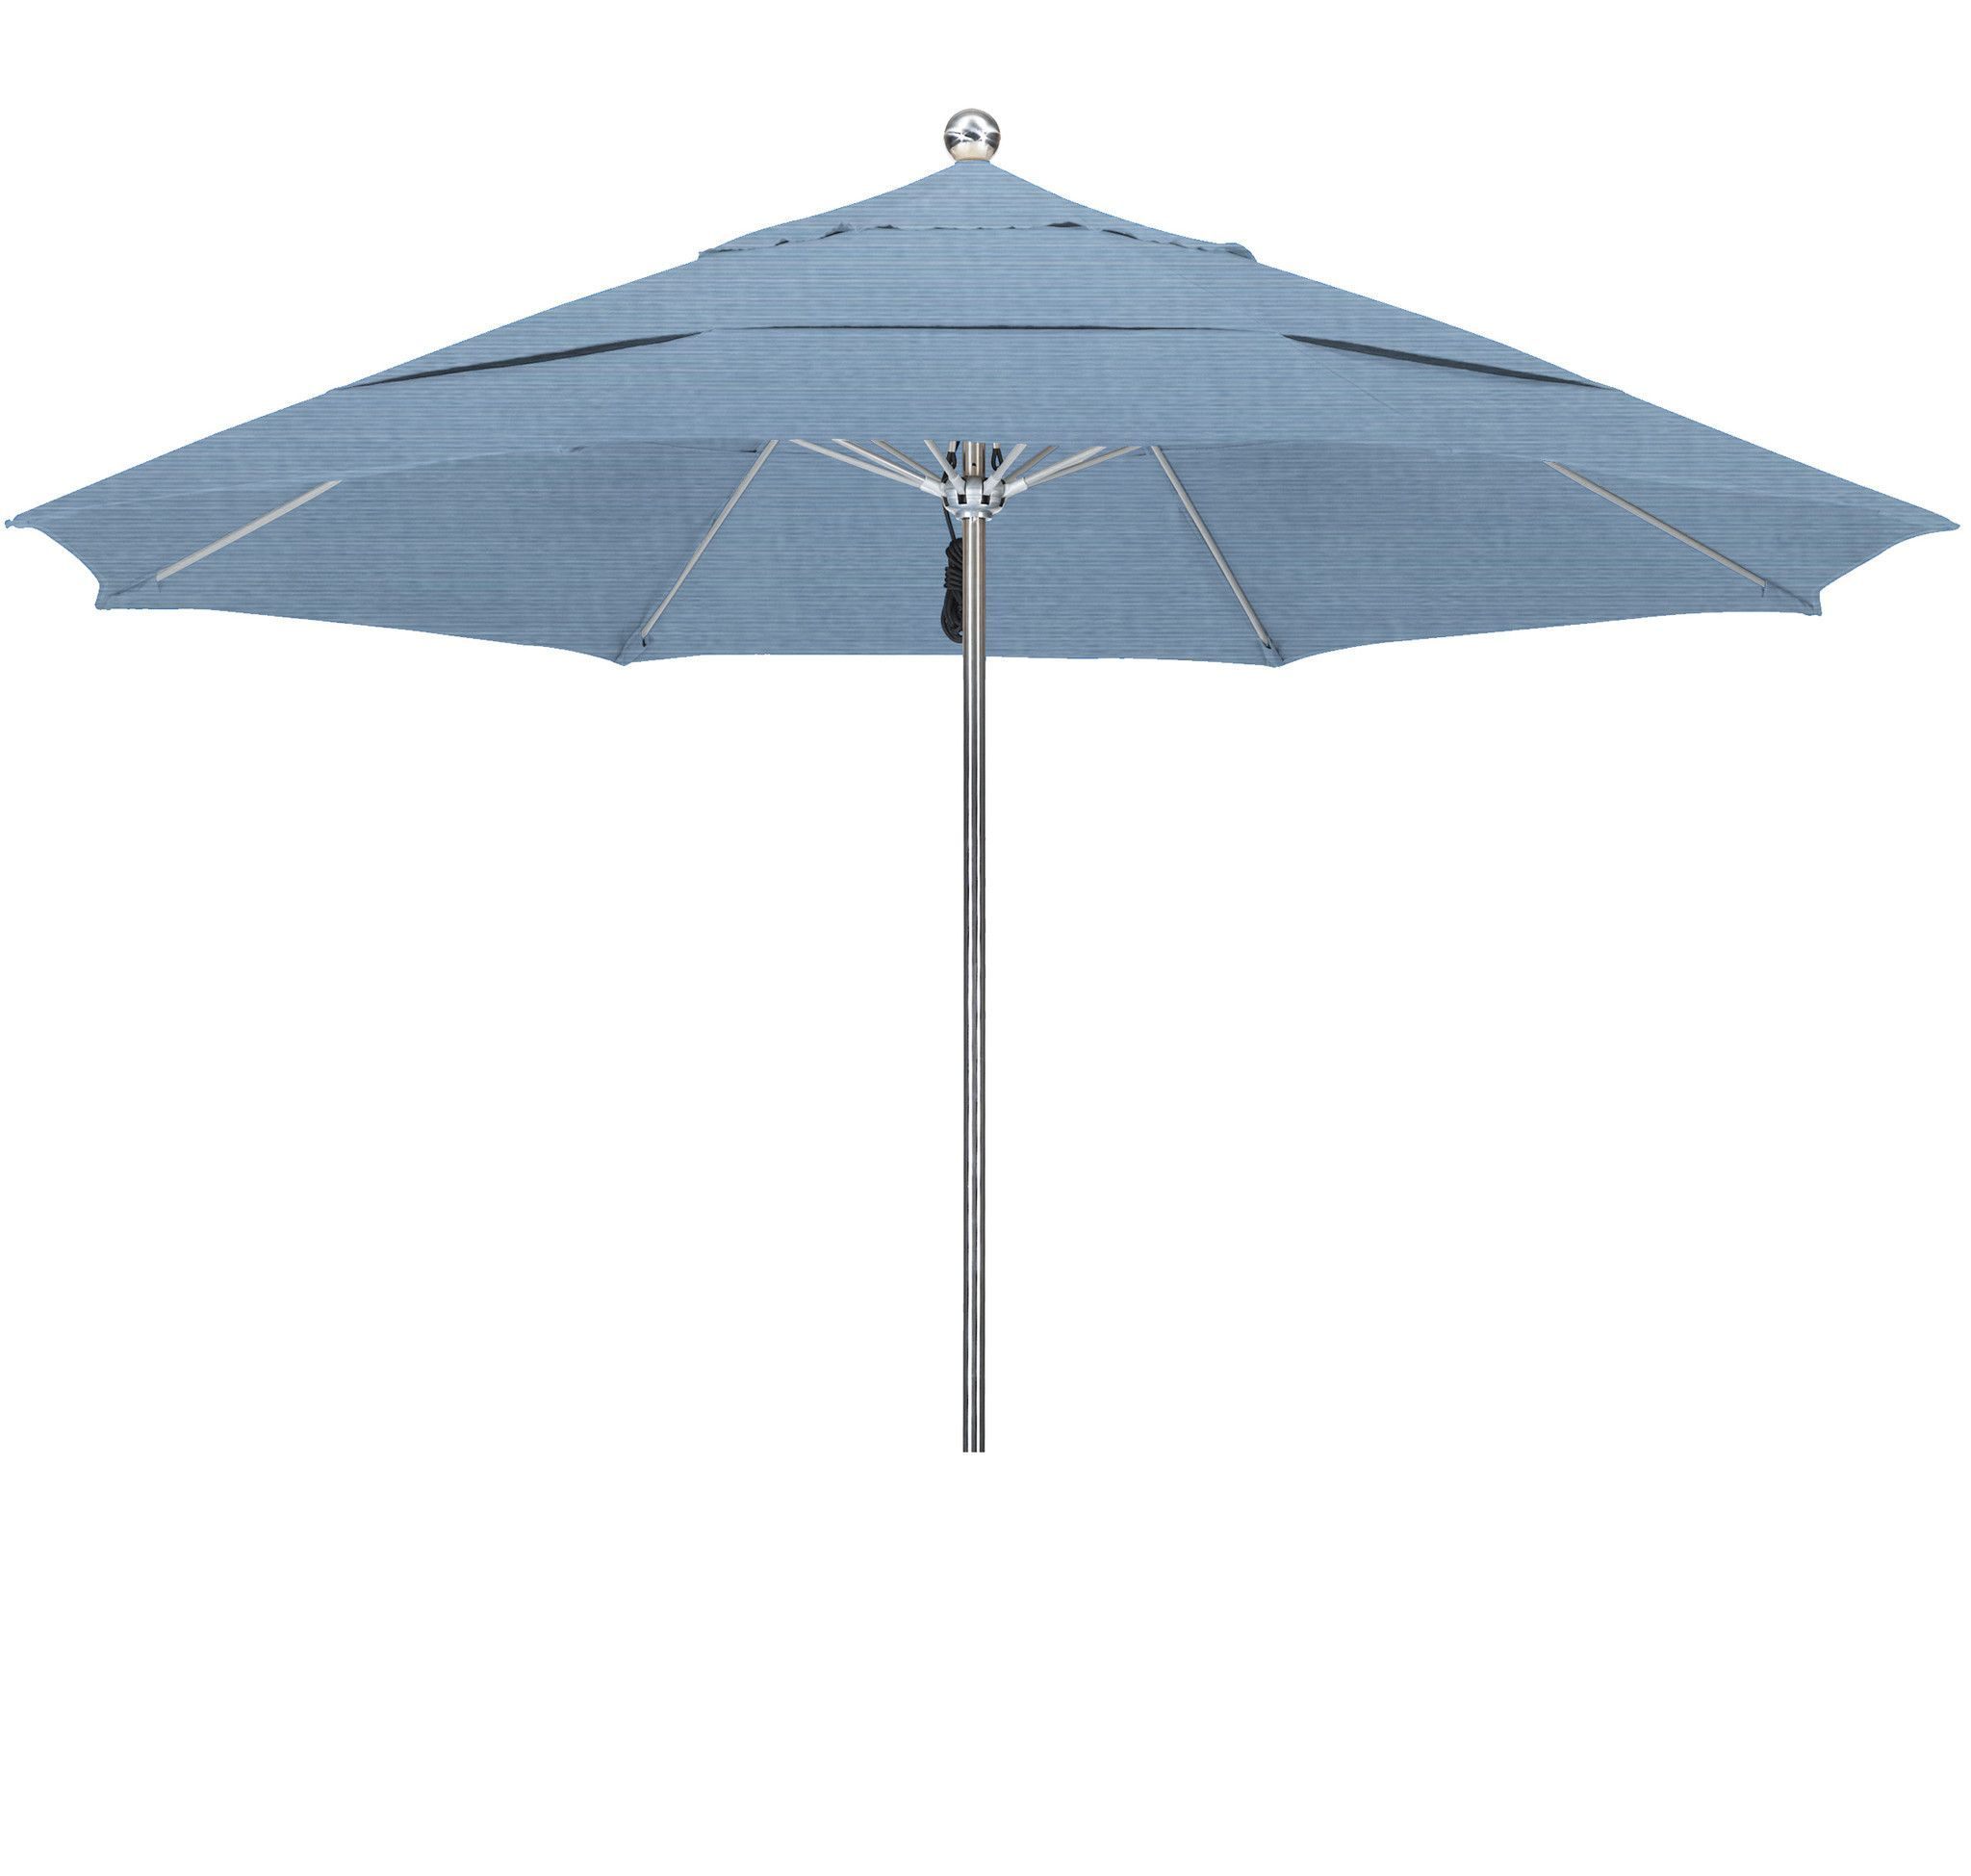 Eclipse Collection 11'SSteel SinglePole FGlass Ribs M Umbrella DV Anodized/Sunbrella/Air Blue